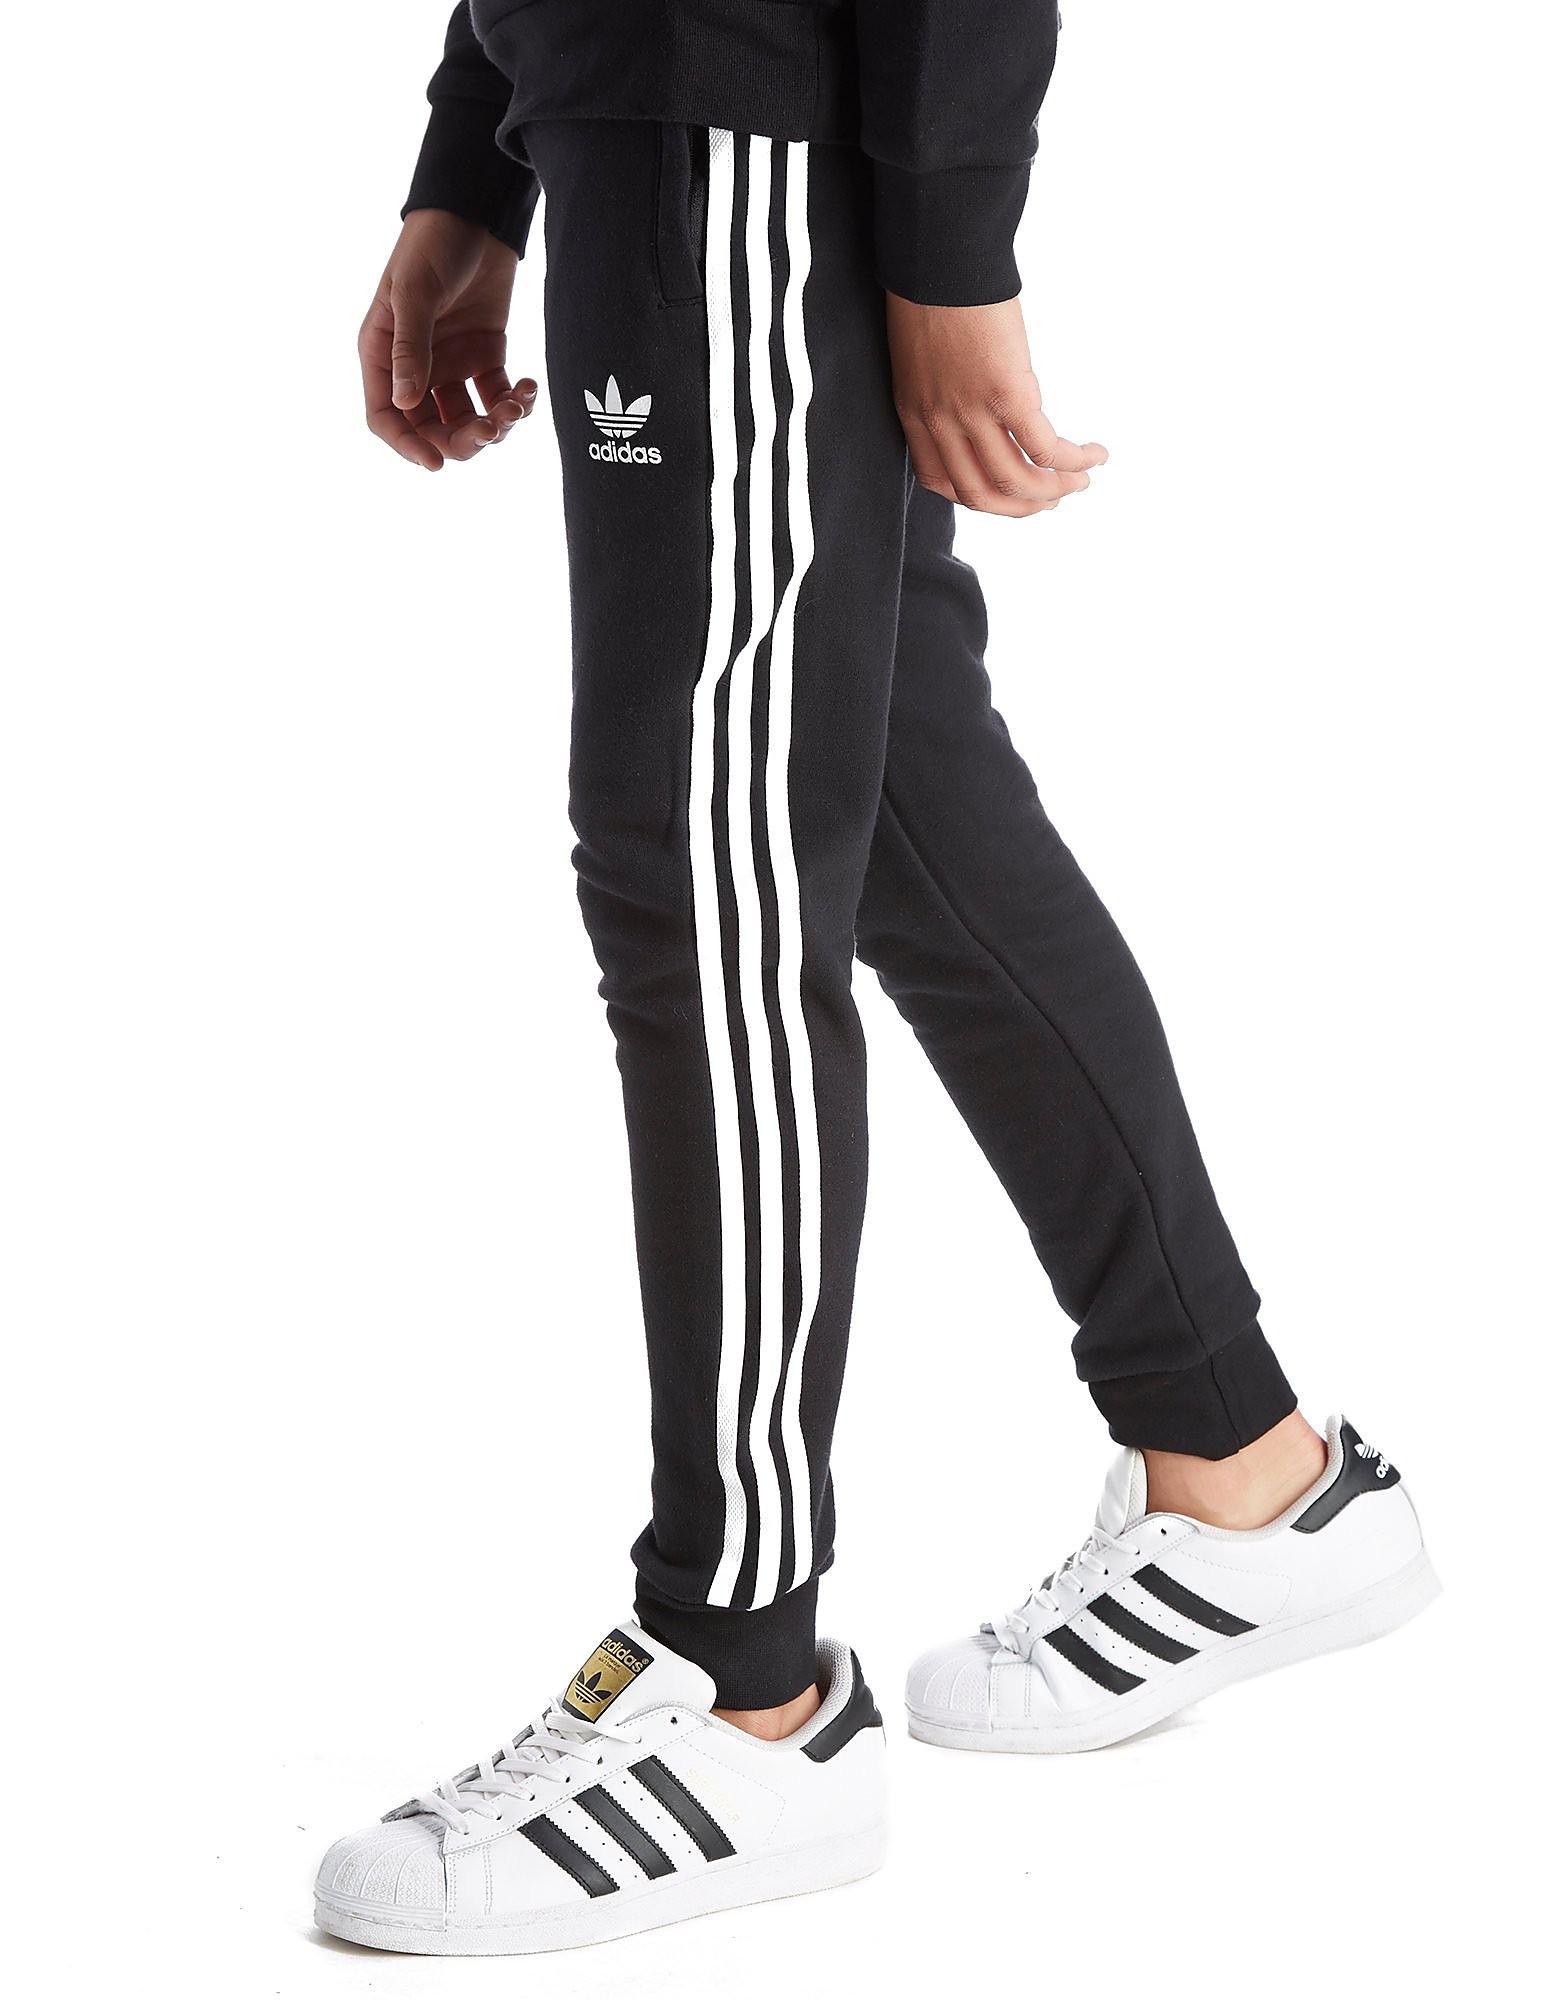 adidas Originals Trefoil 3-Stripes Pants Junior